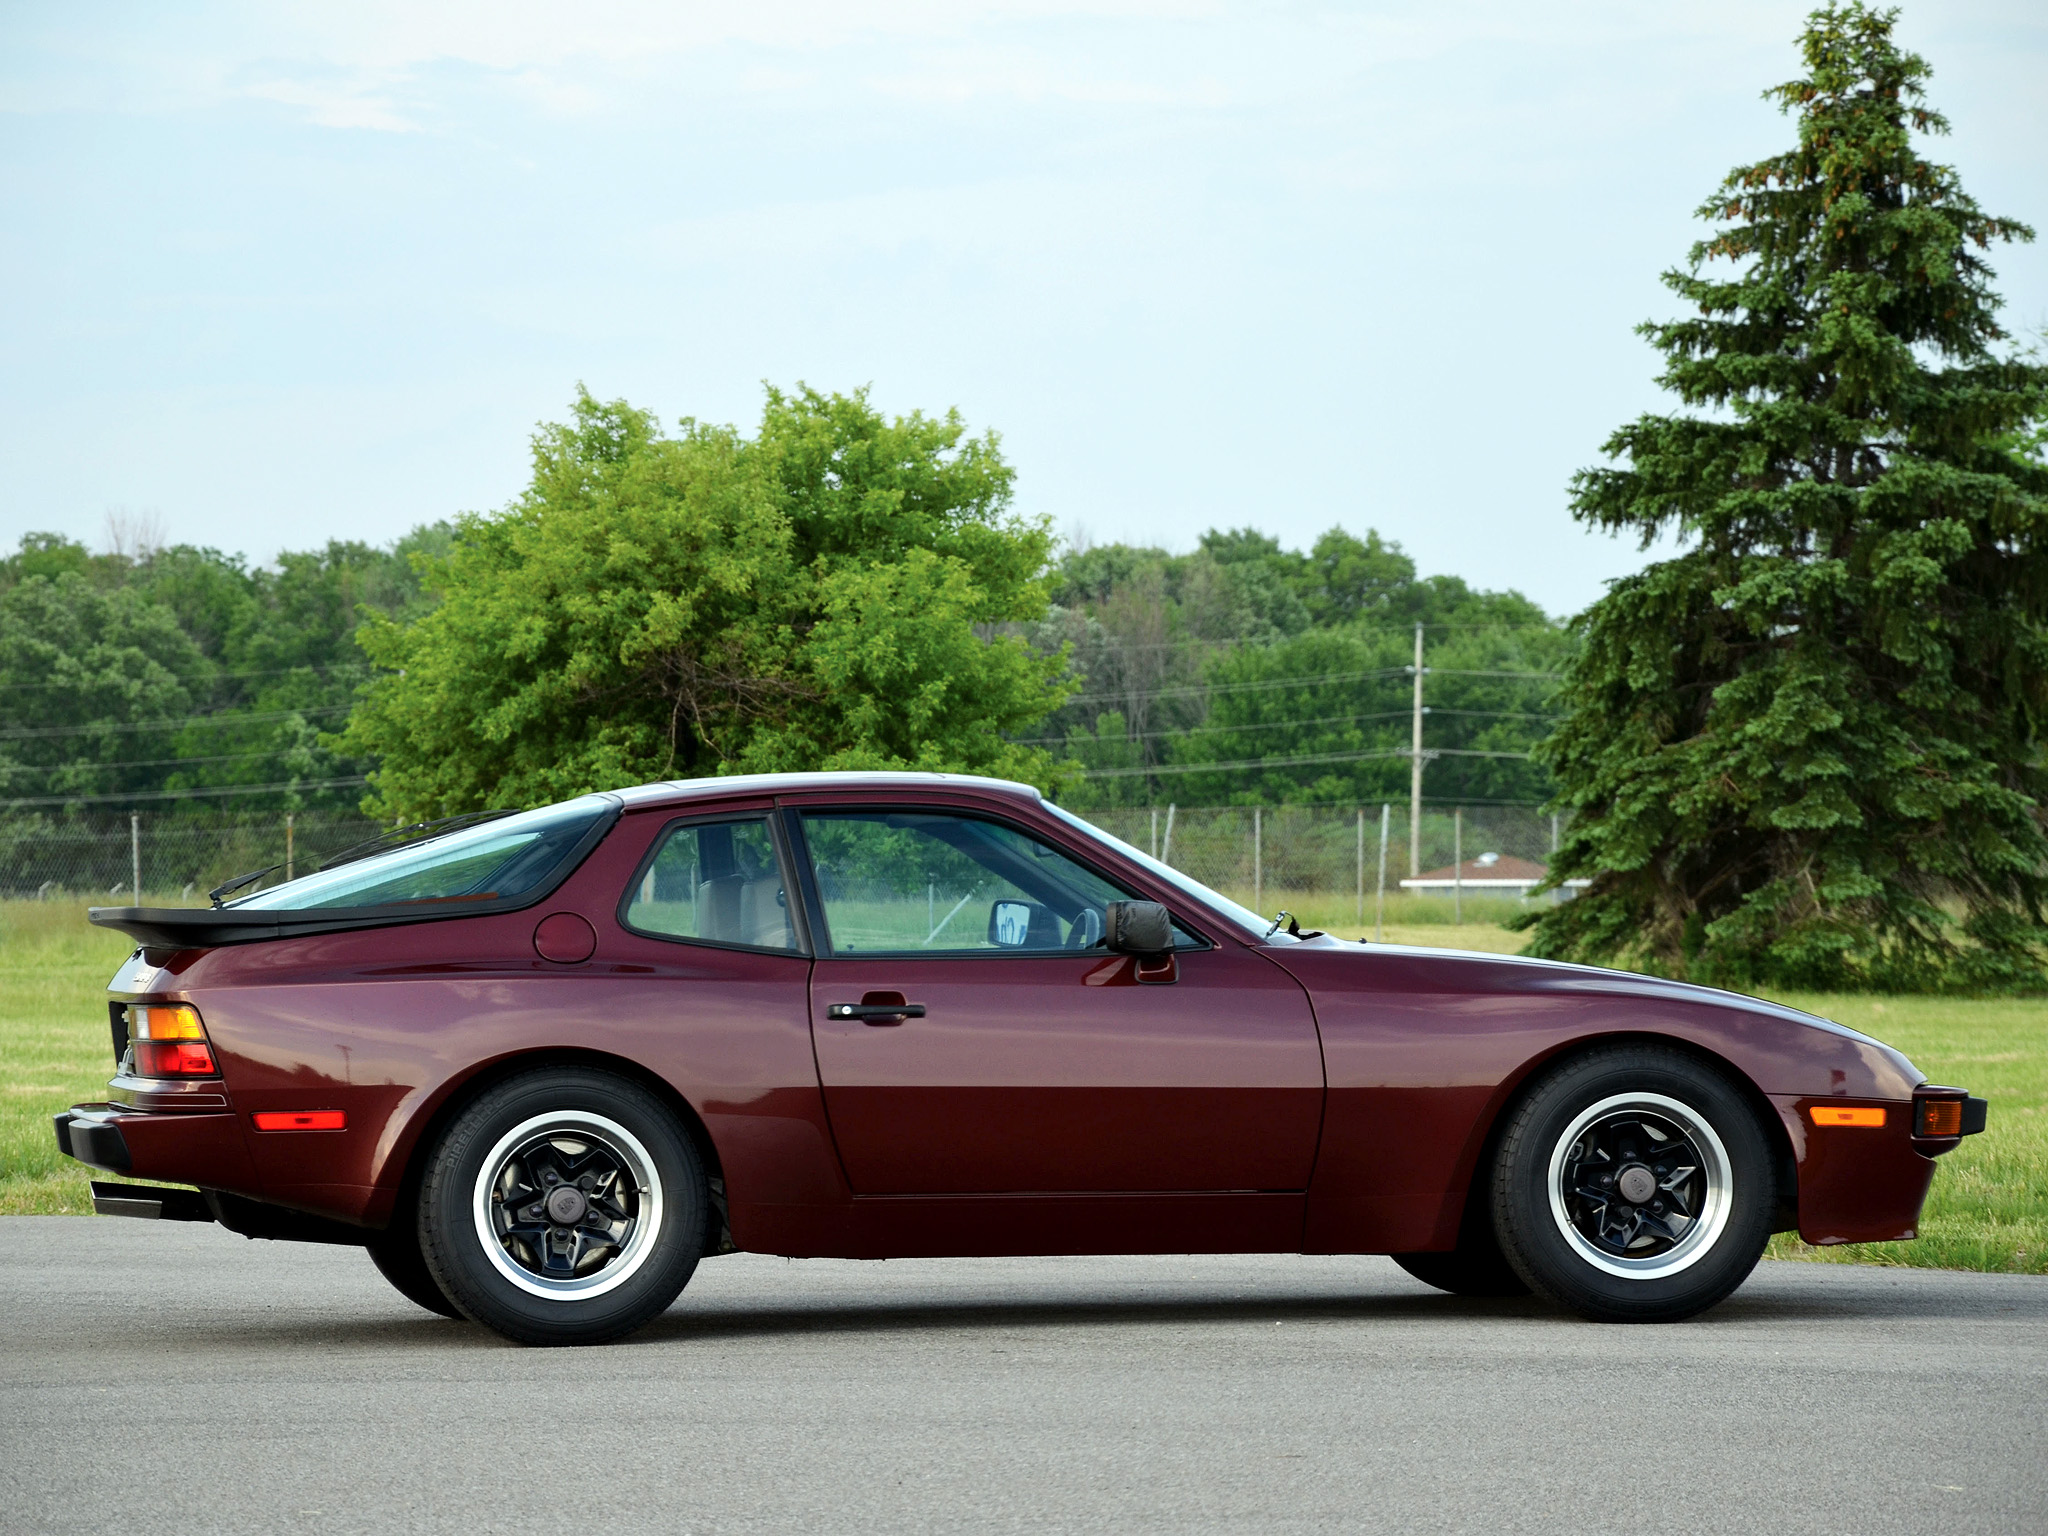 1982-porsche-944-coupe-us-spec-wallpaper-right-side.jpg